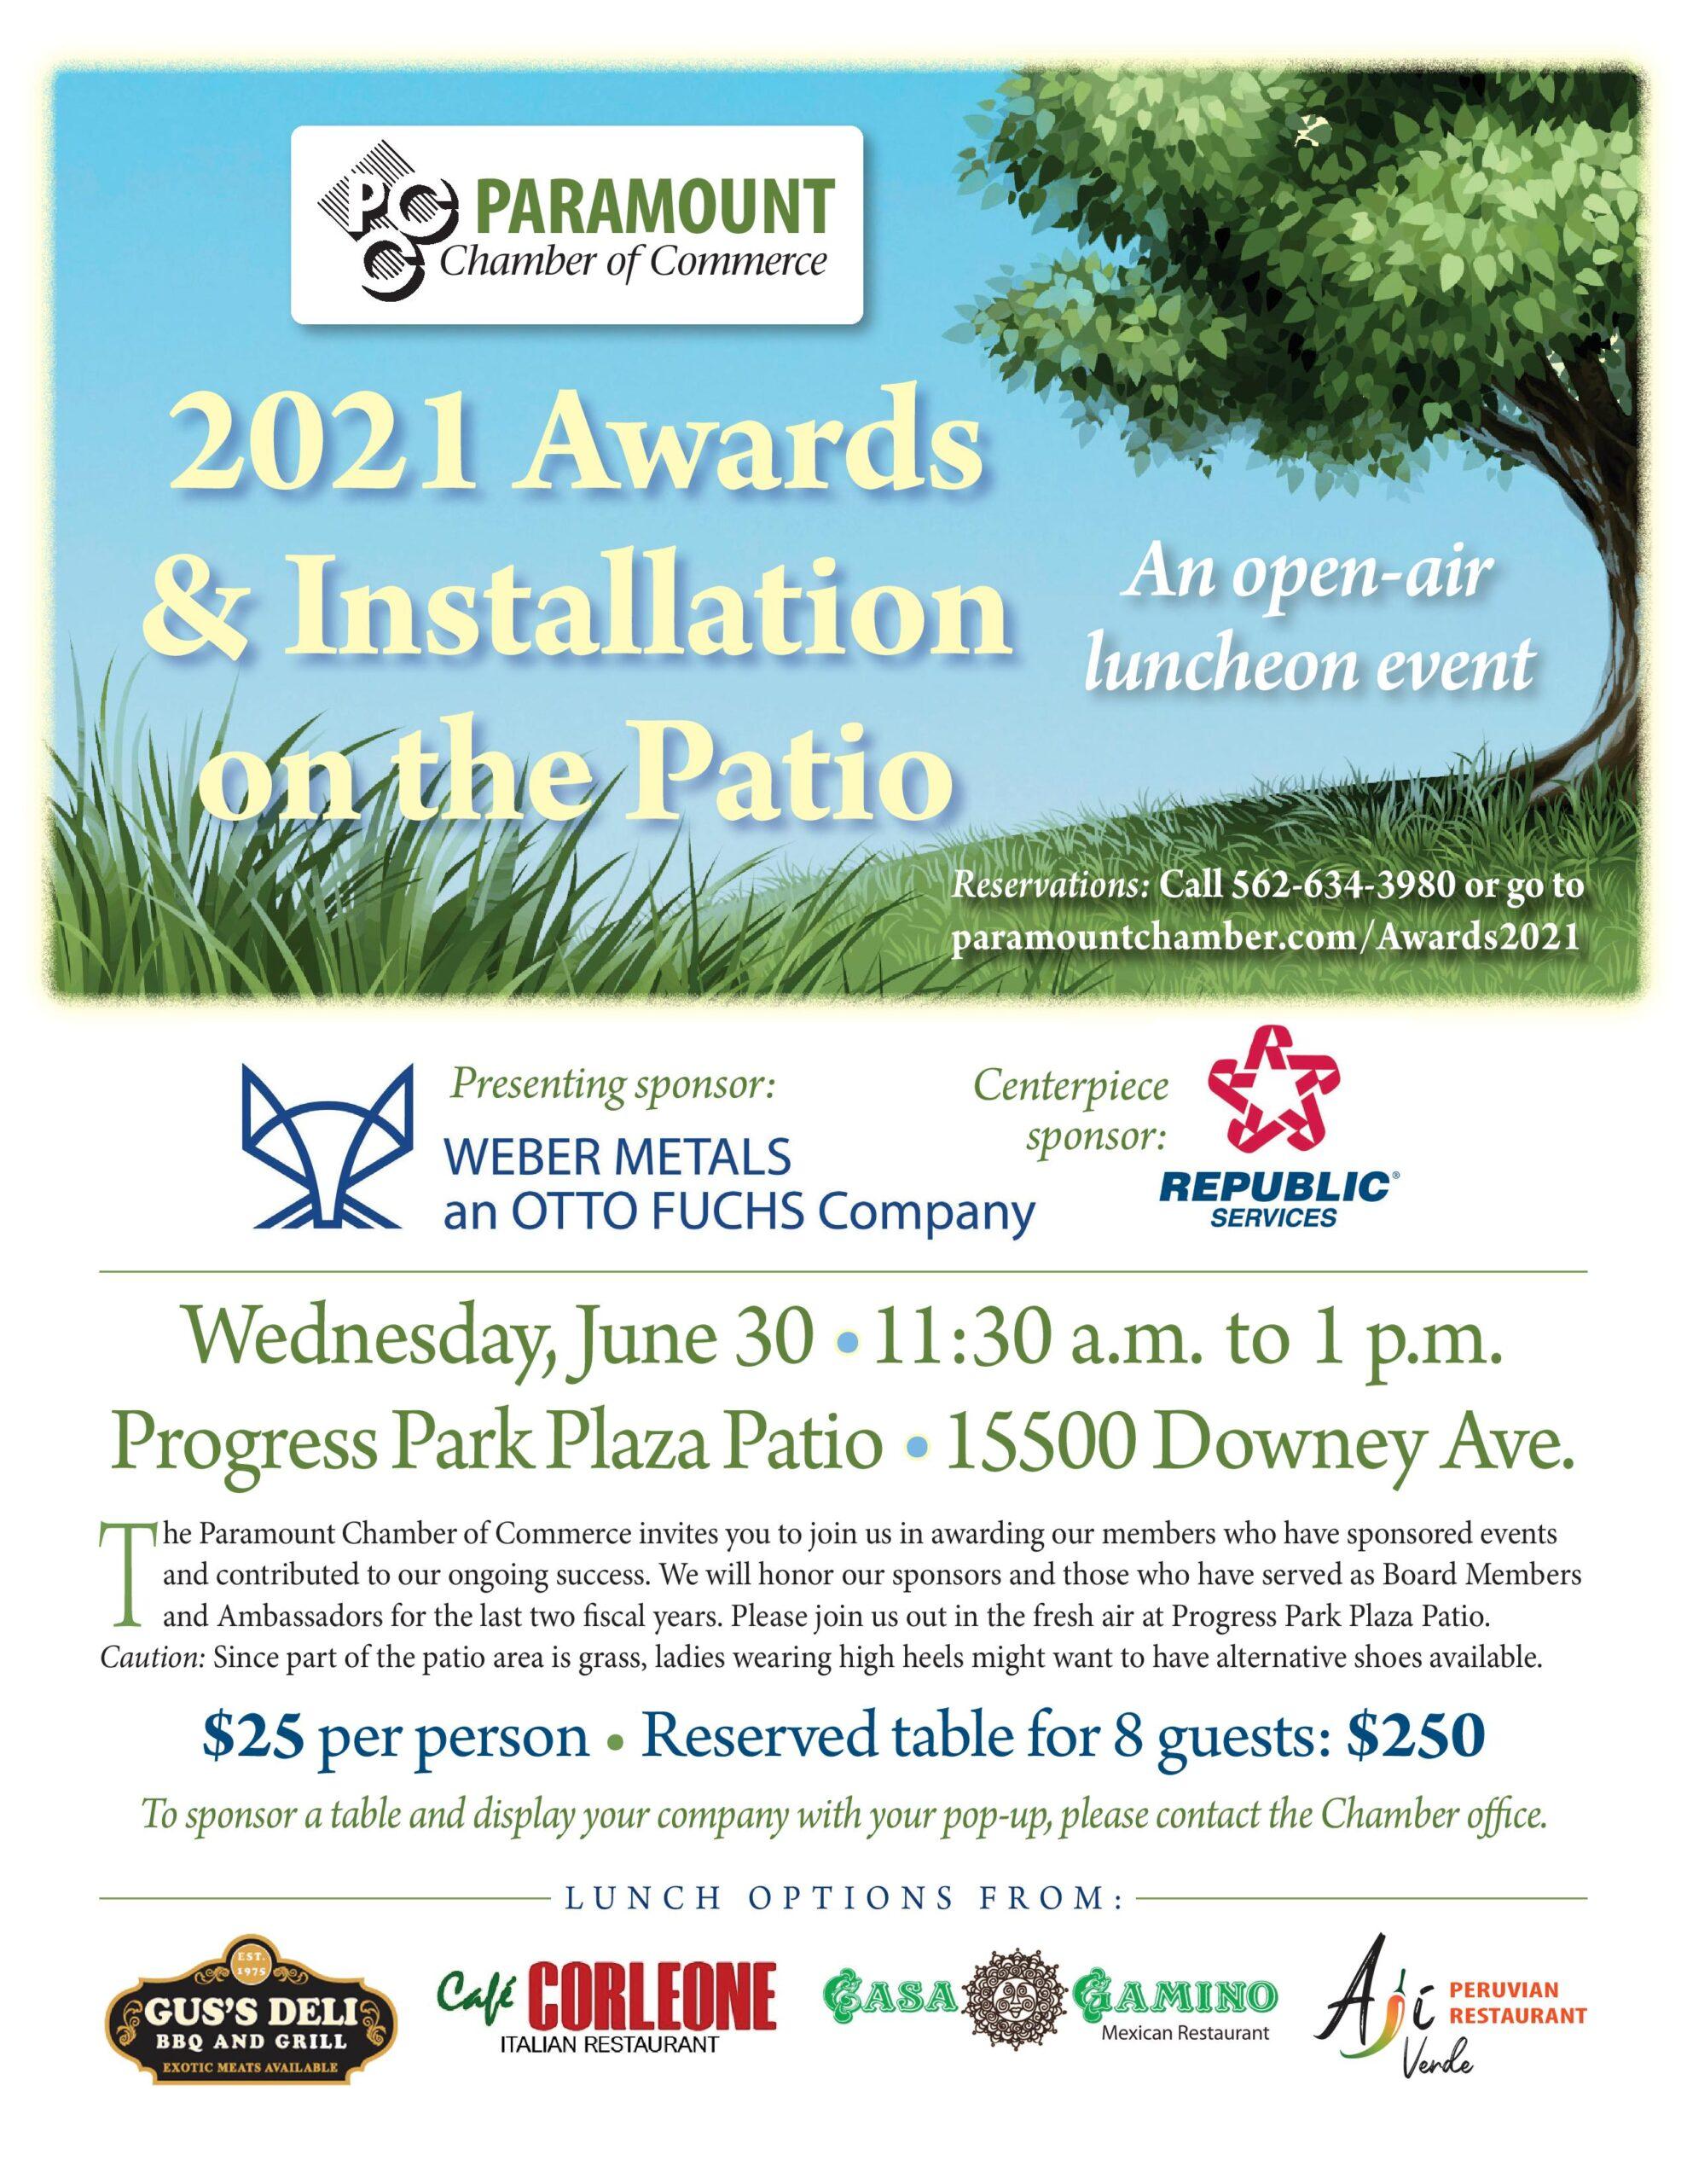 Awards & Installation flyer - Version 2-page-001